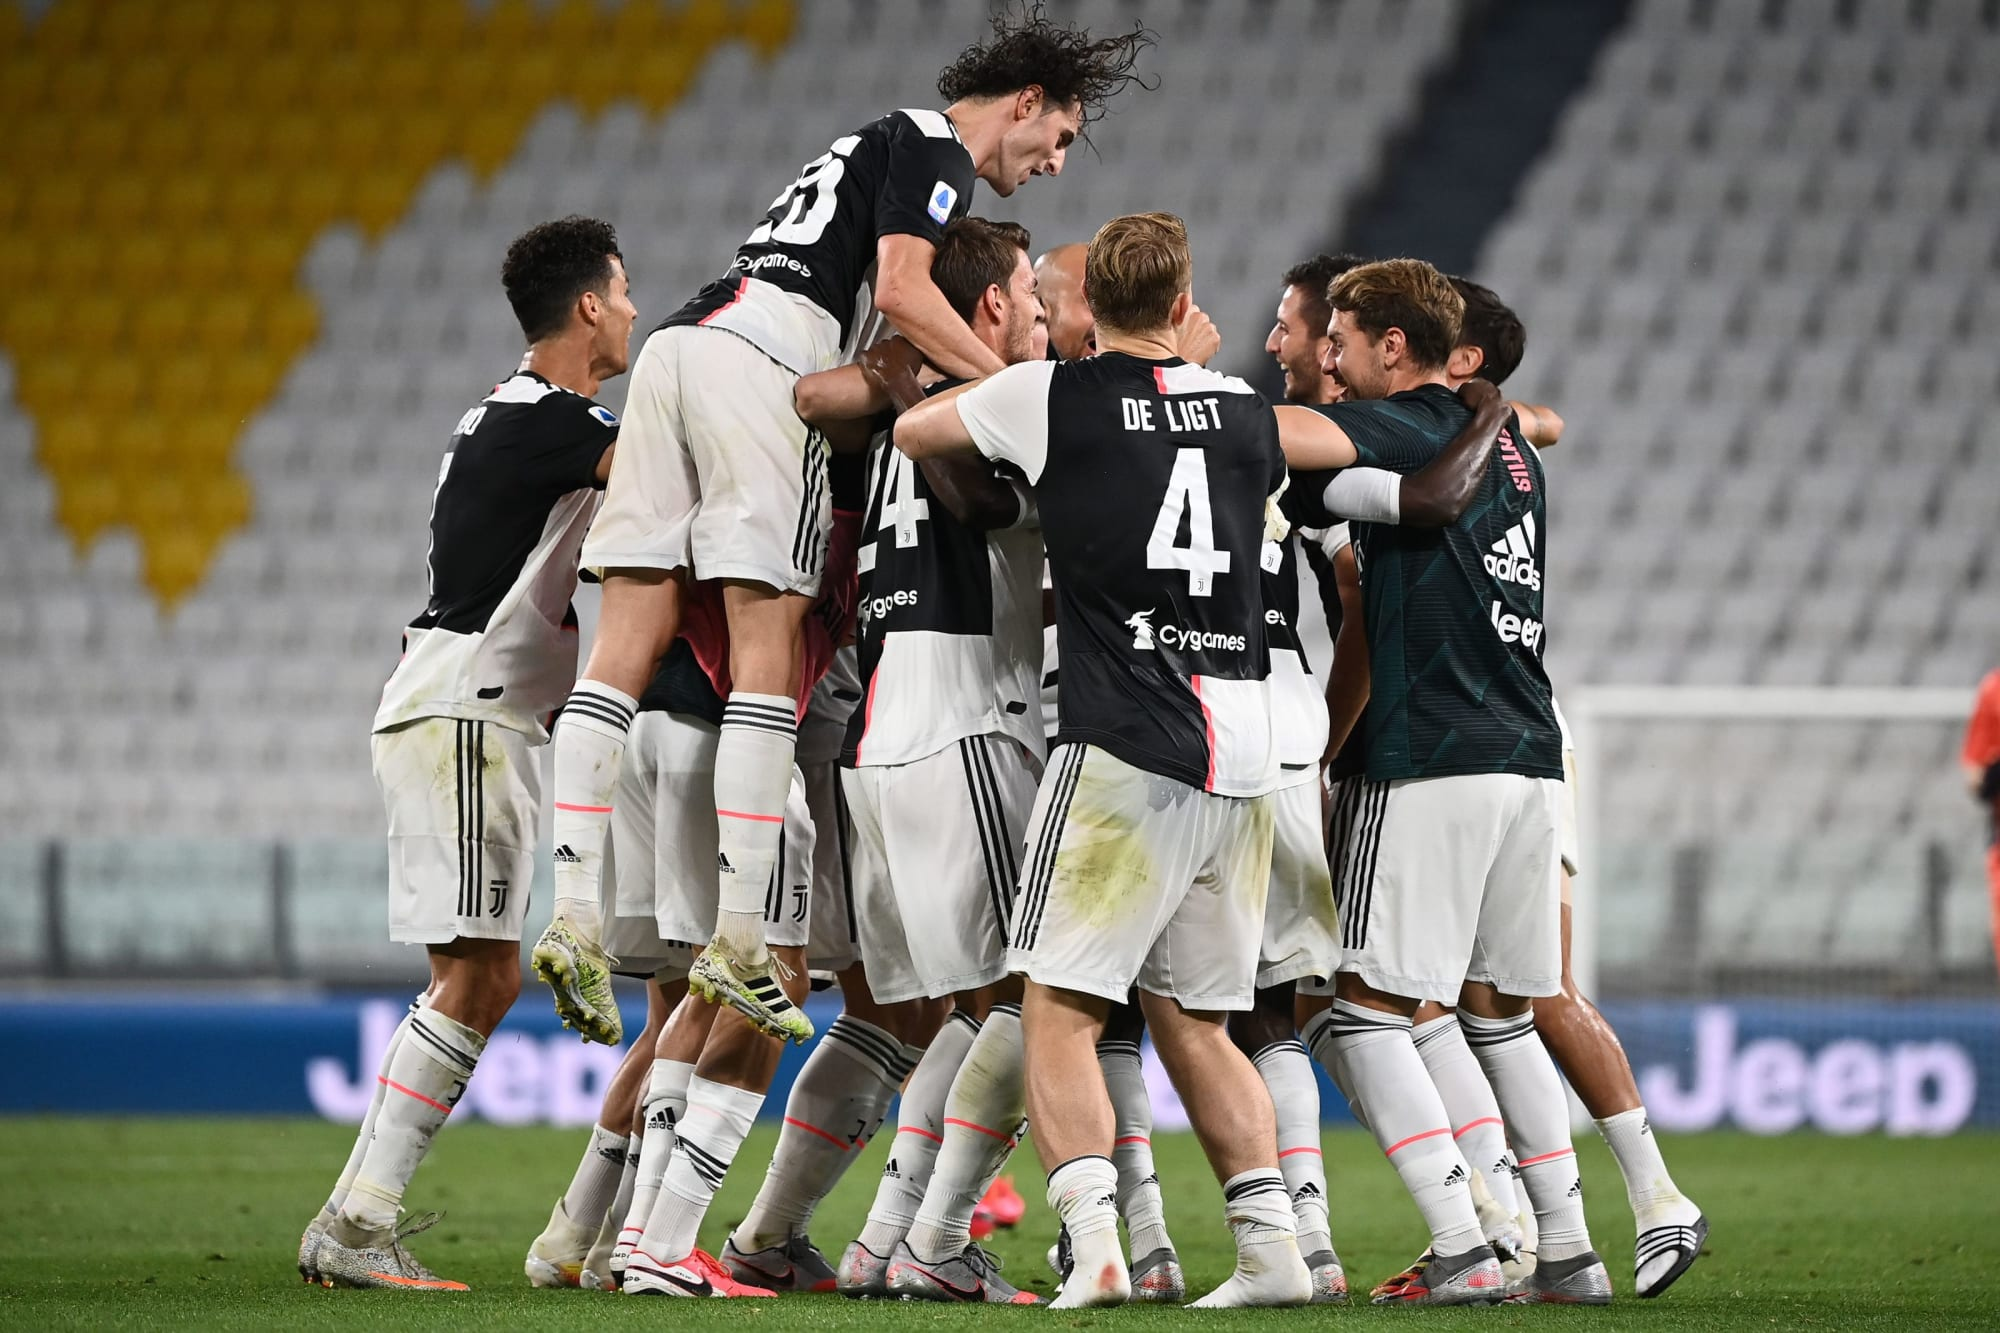 Serie A 2019-20 review: Pandemic-plagued season yields few surprises